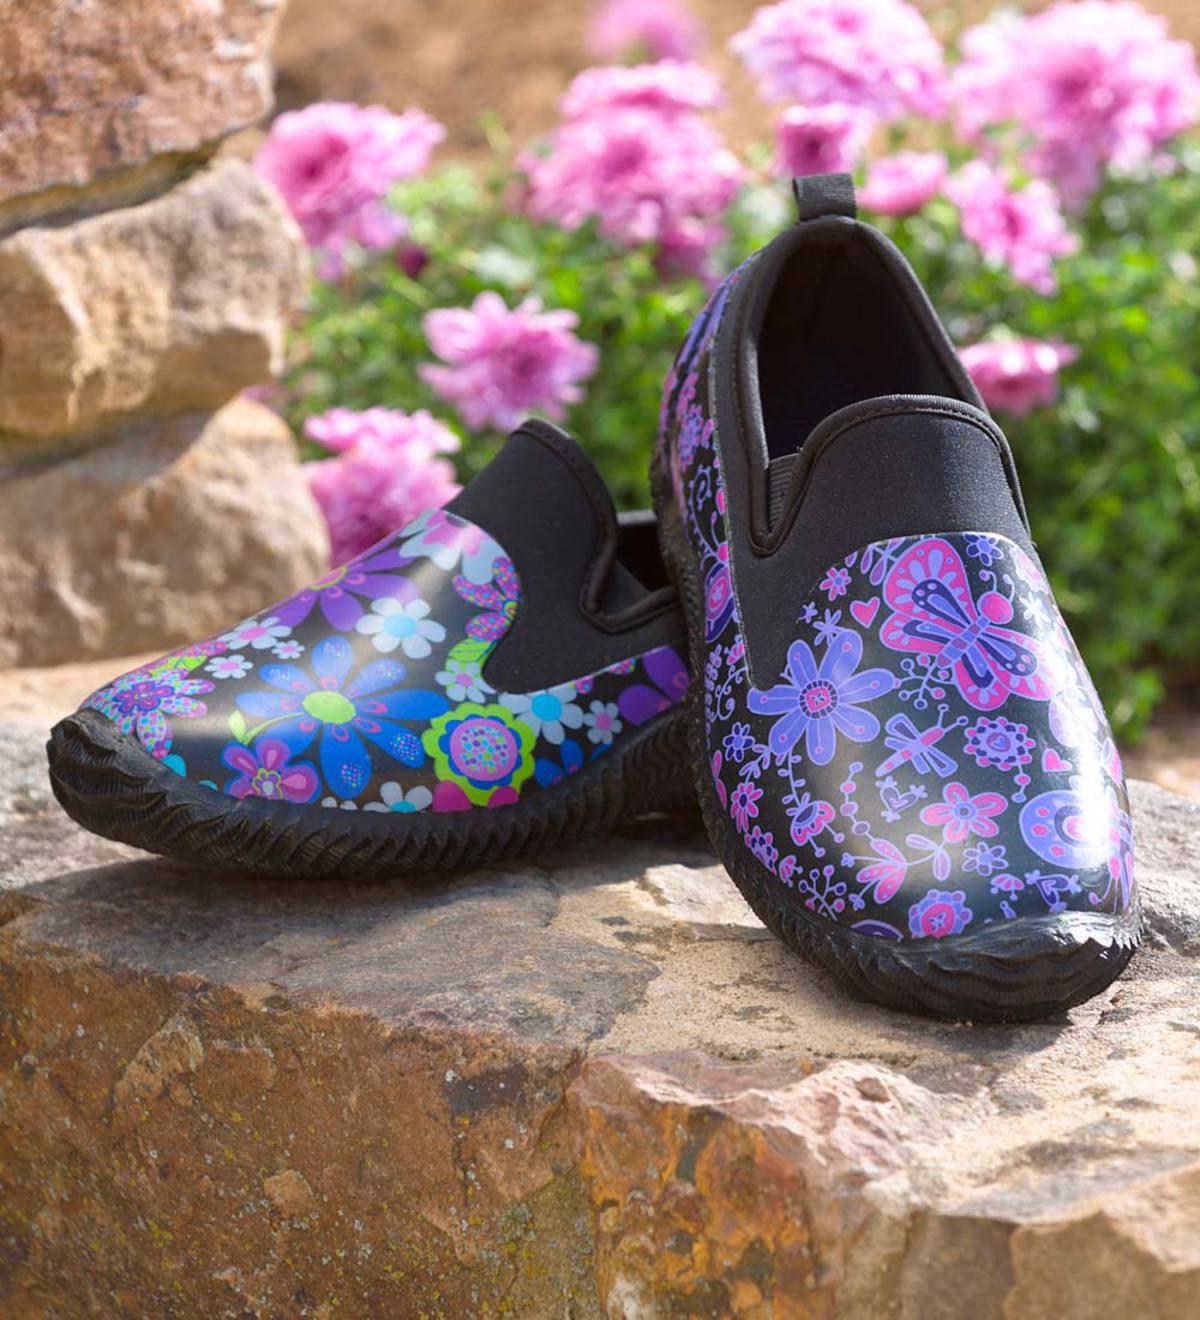 Waterproof Slip-On Floral Garden Shoes